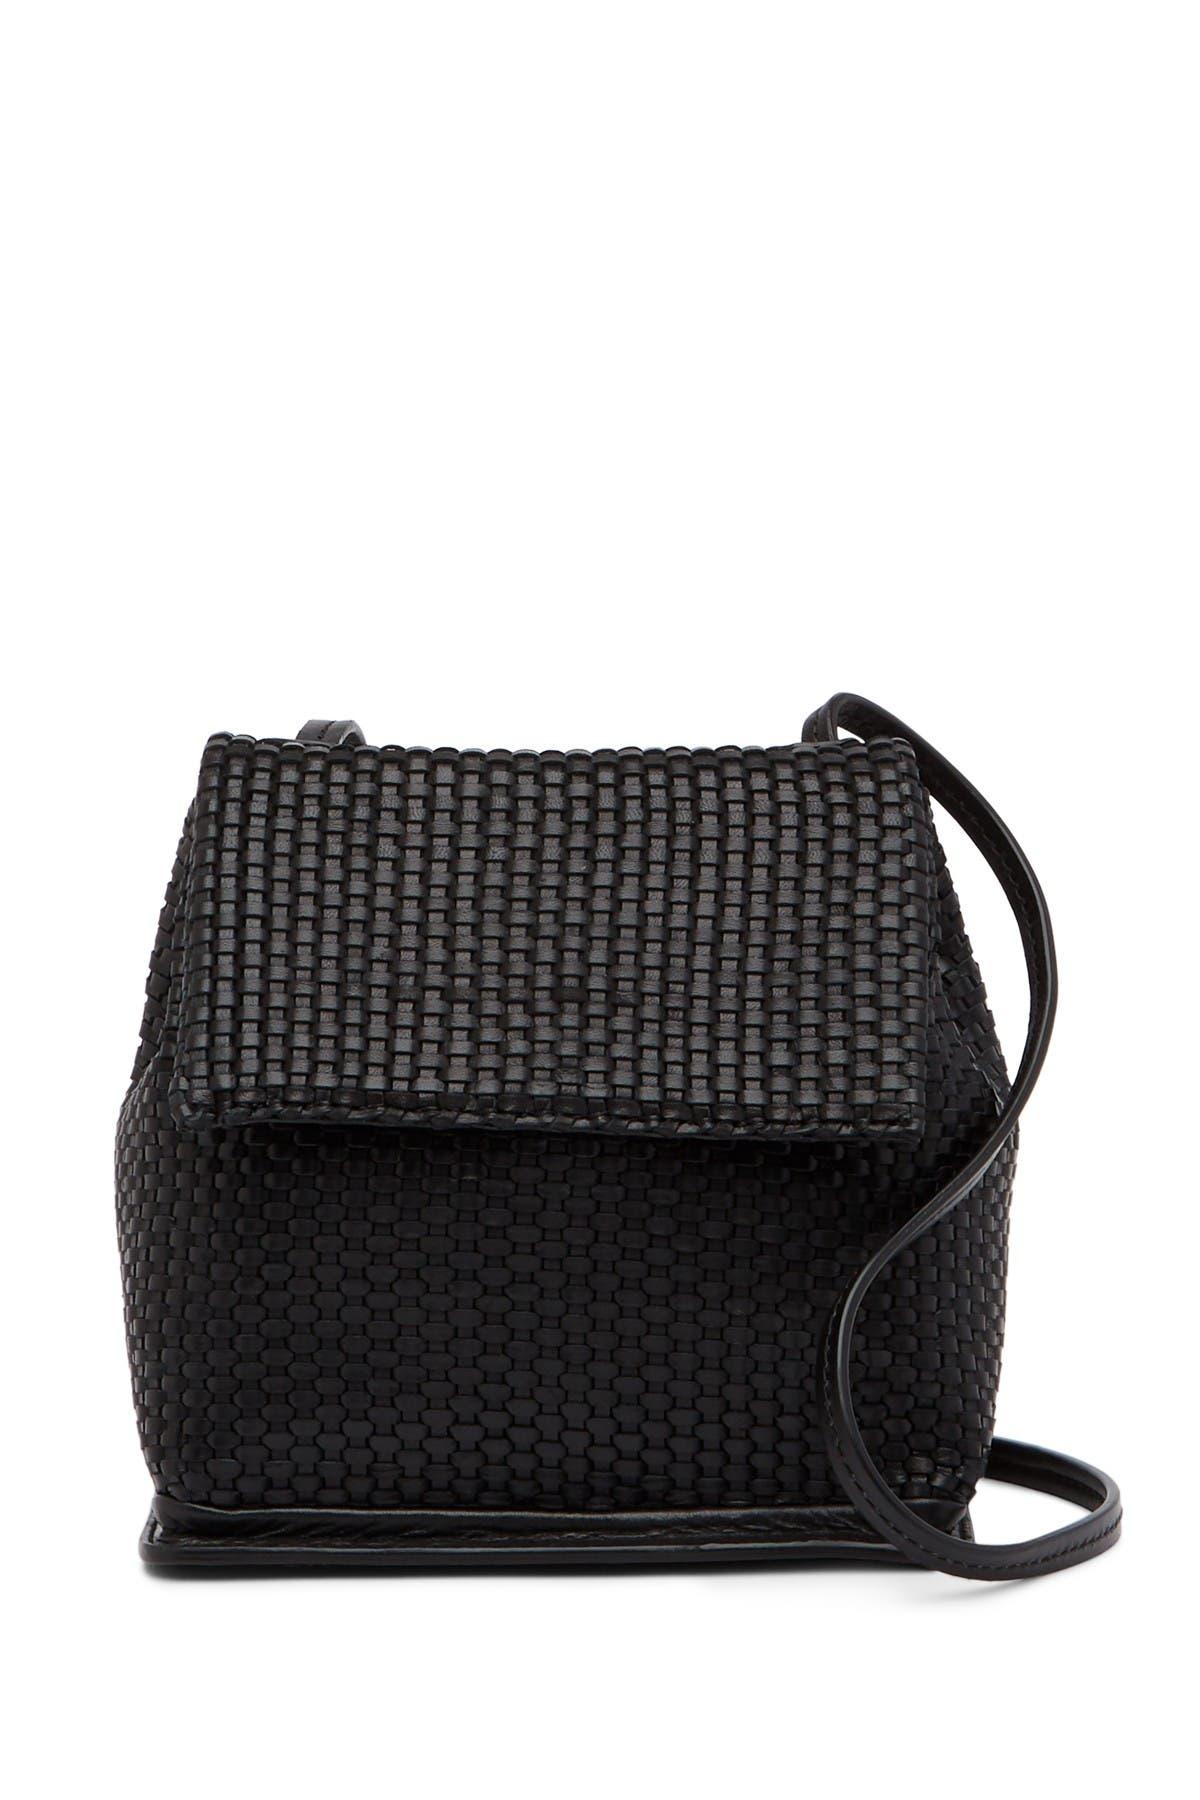 Image of Christopher Kon Mini Weave Leather Crossbody Bag